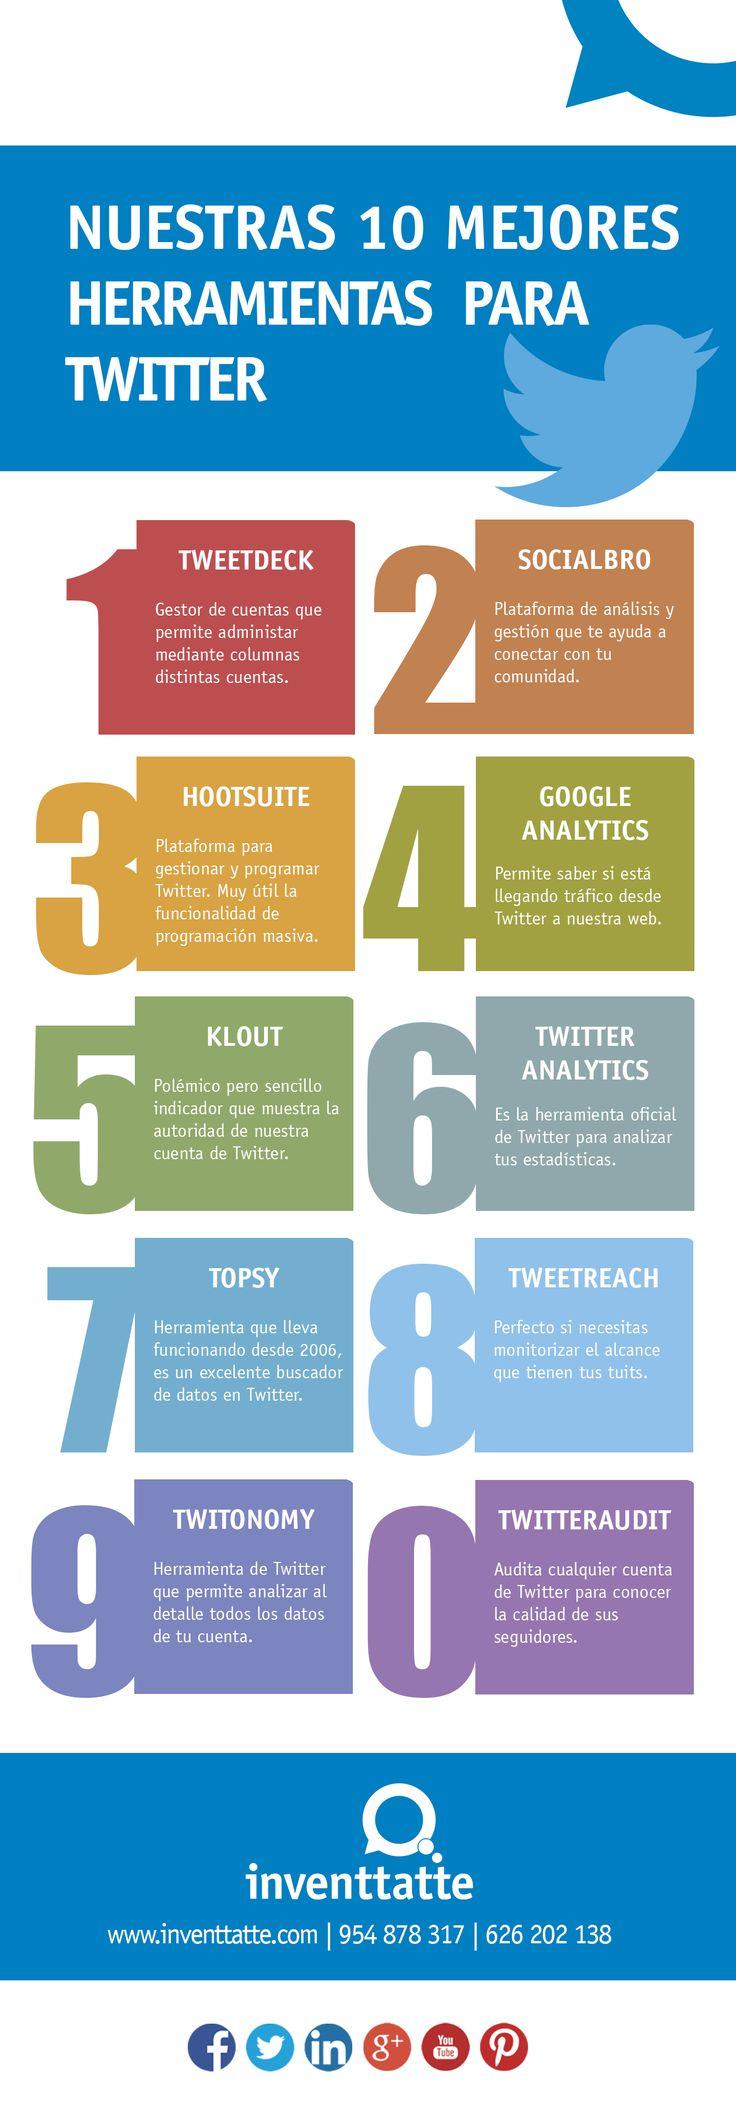 #Herramientas para #Twitter